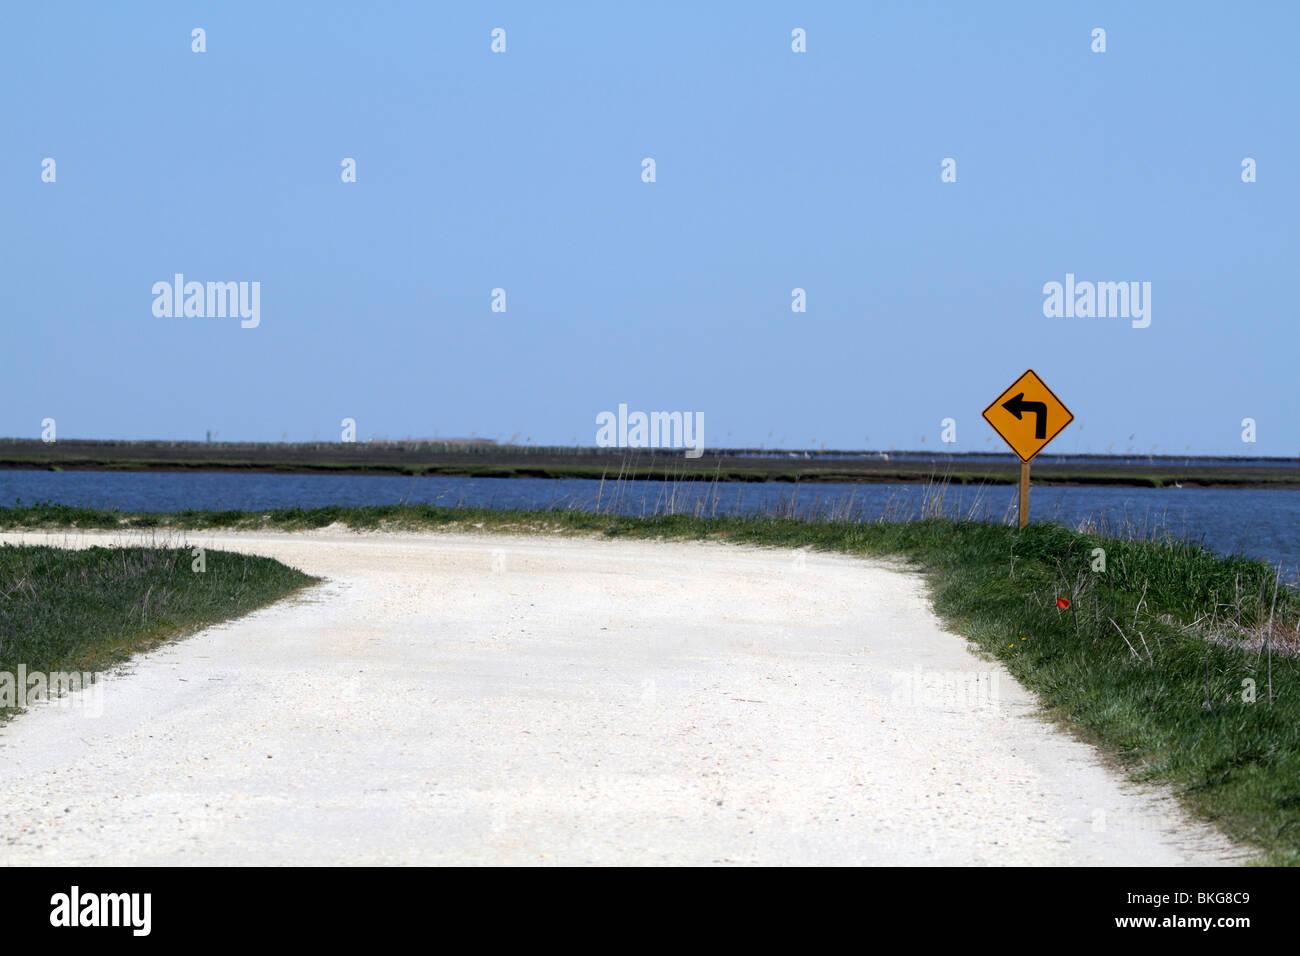 Unpaved road bending left - Stock Image